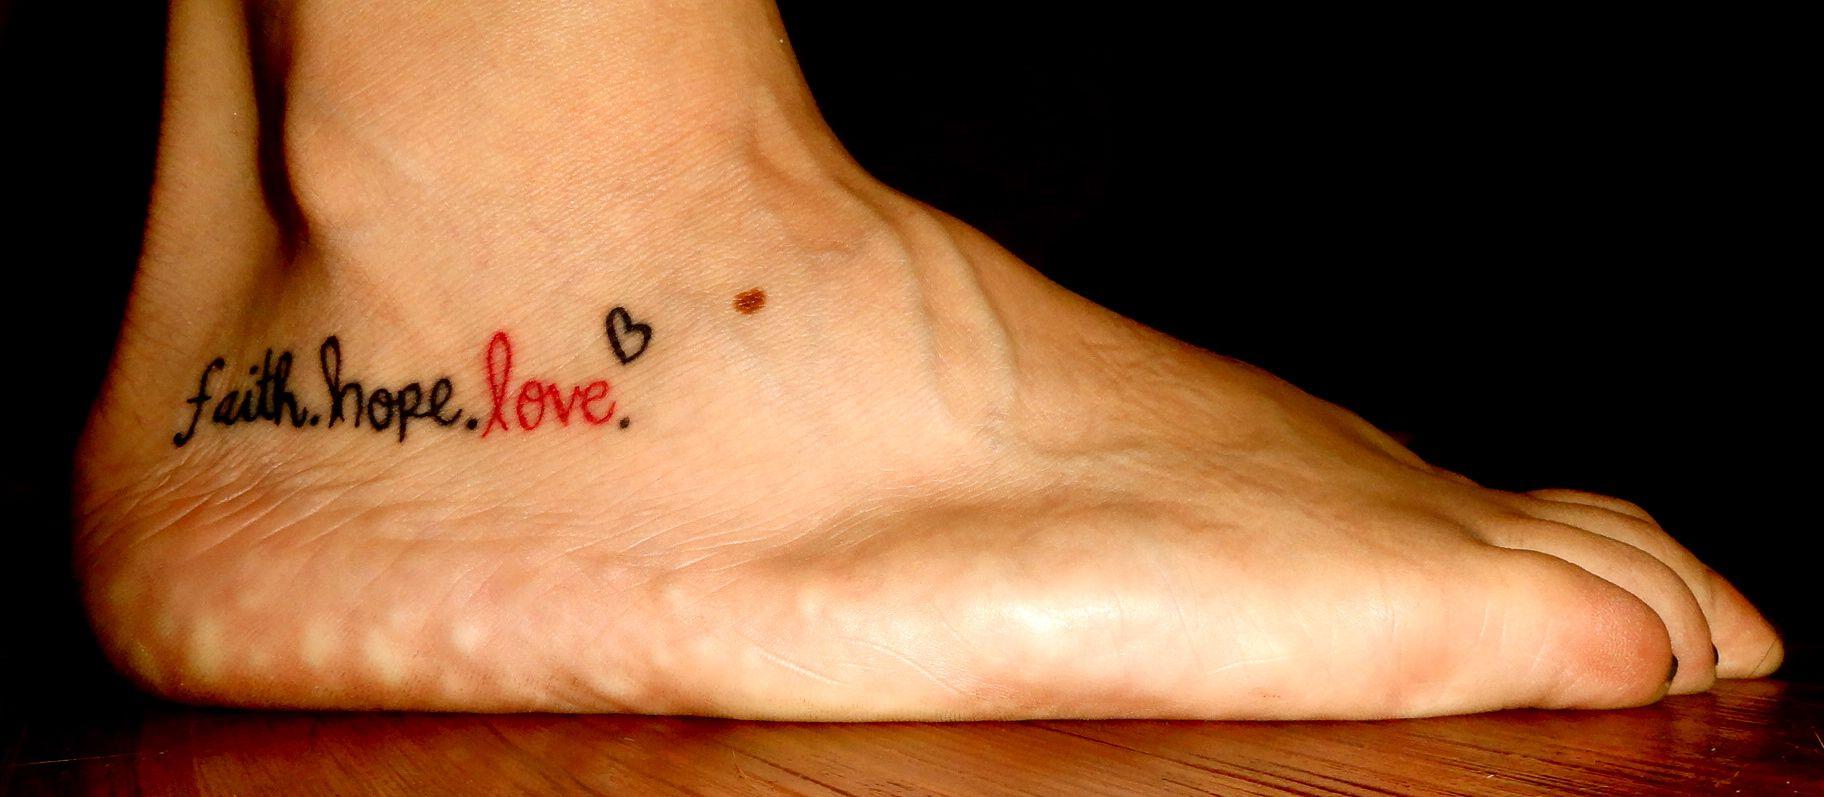 Tattoo Glaube Liebe Hoffnung Ideen